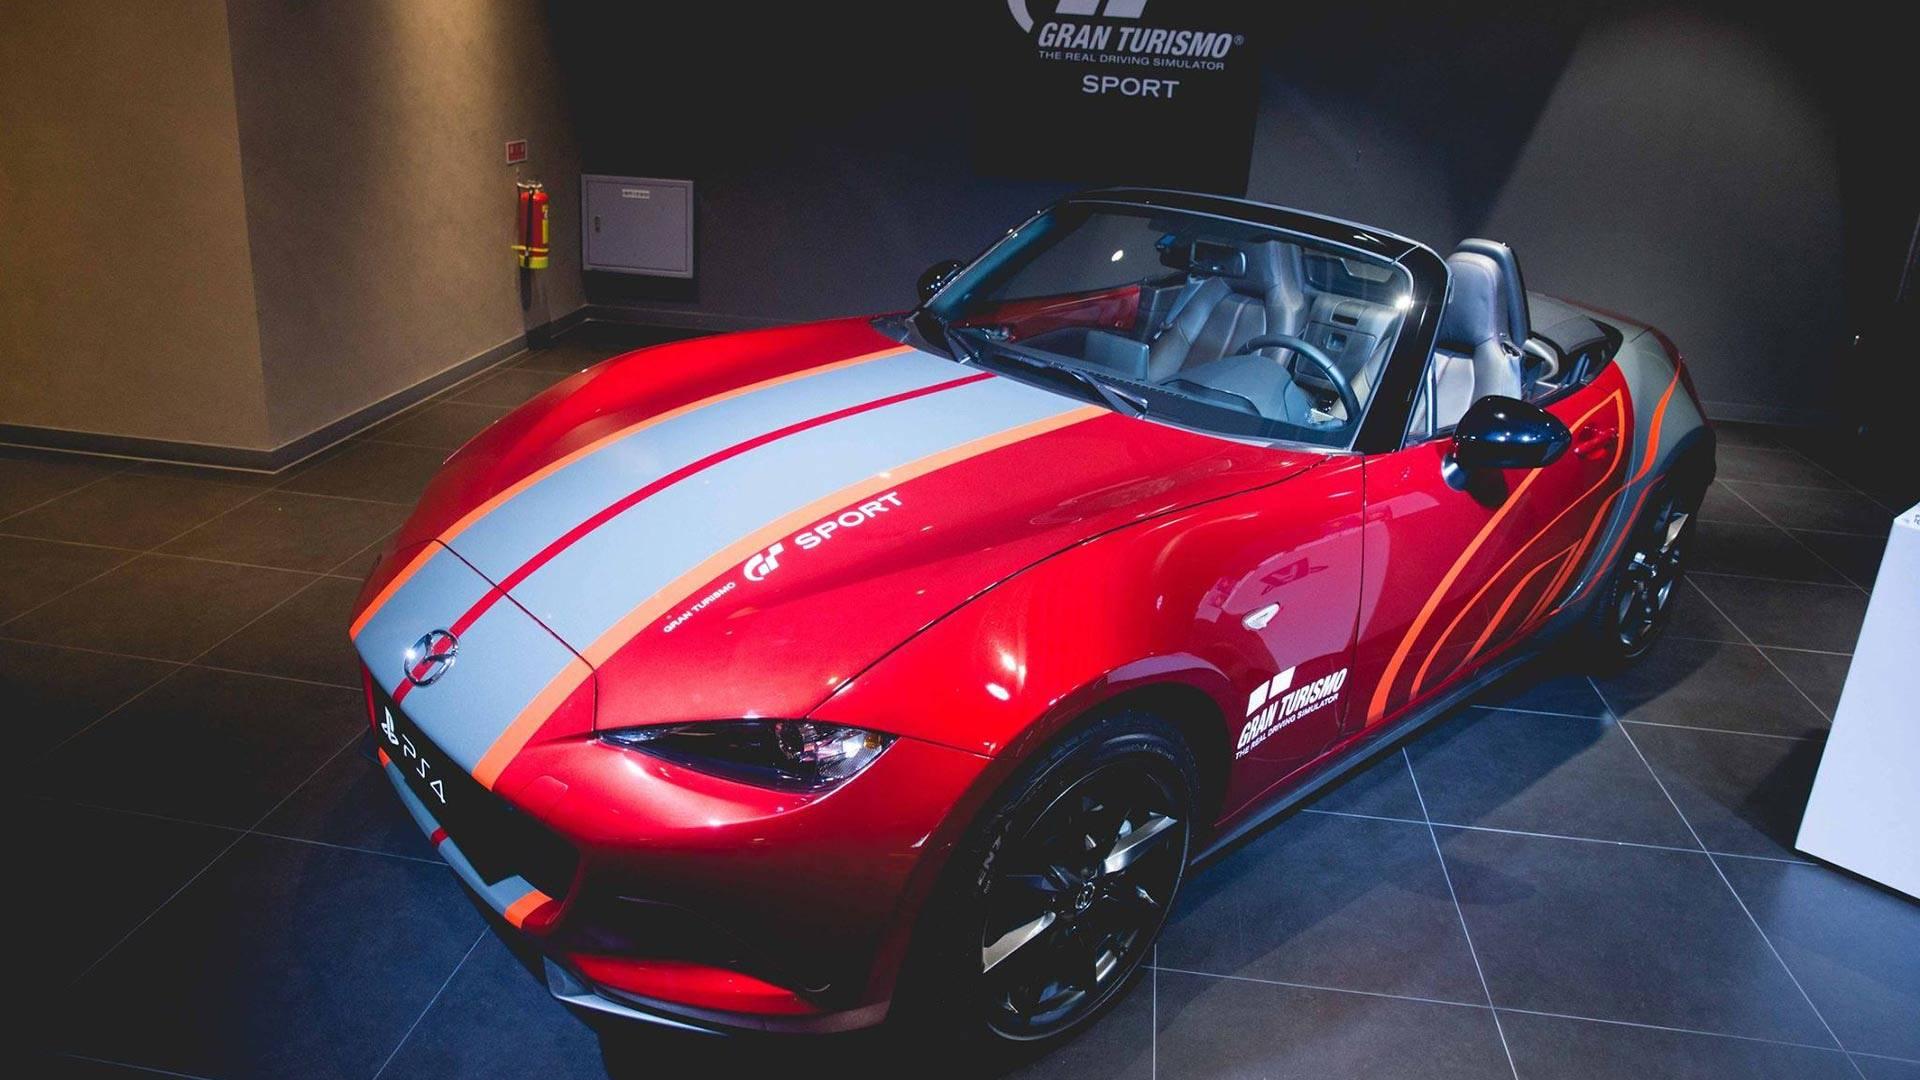 $46,300 Gran Turismo Sport Bundle Includes Real Miata, 4K TV